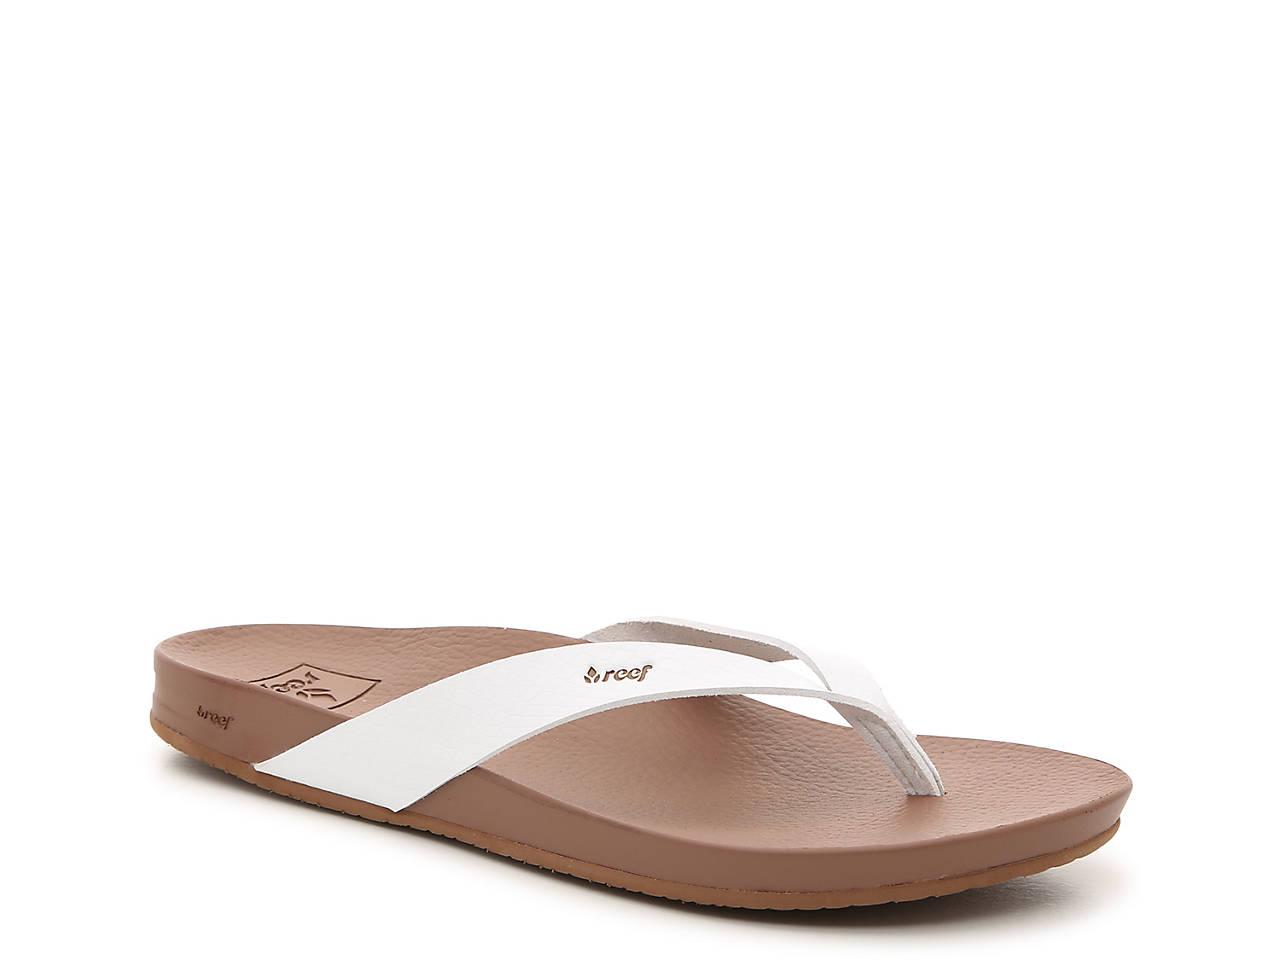 ed4cc2b2f061 Reef Cushion Bounce Court Flip Flop Women s Shoes